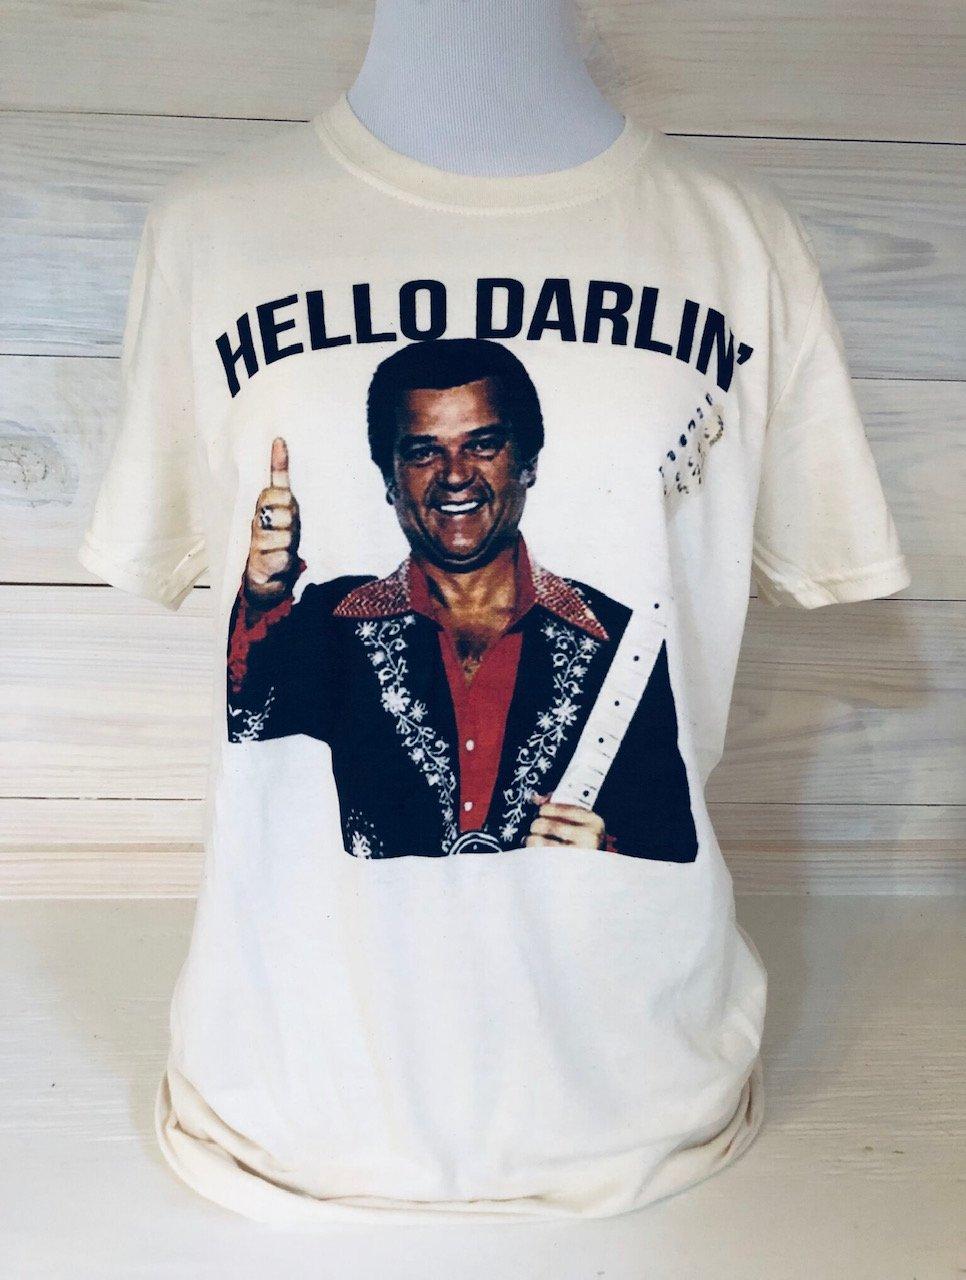 Hello Darlin' on Cream Tultex Tee